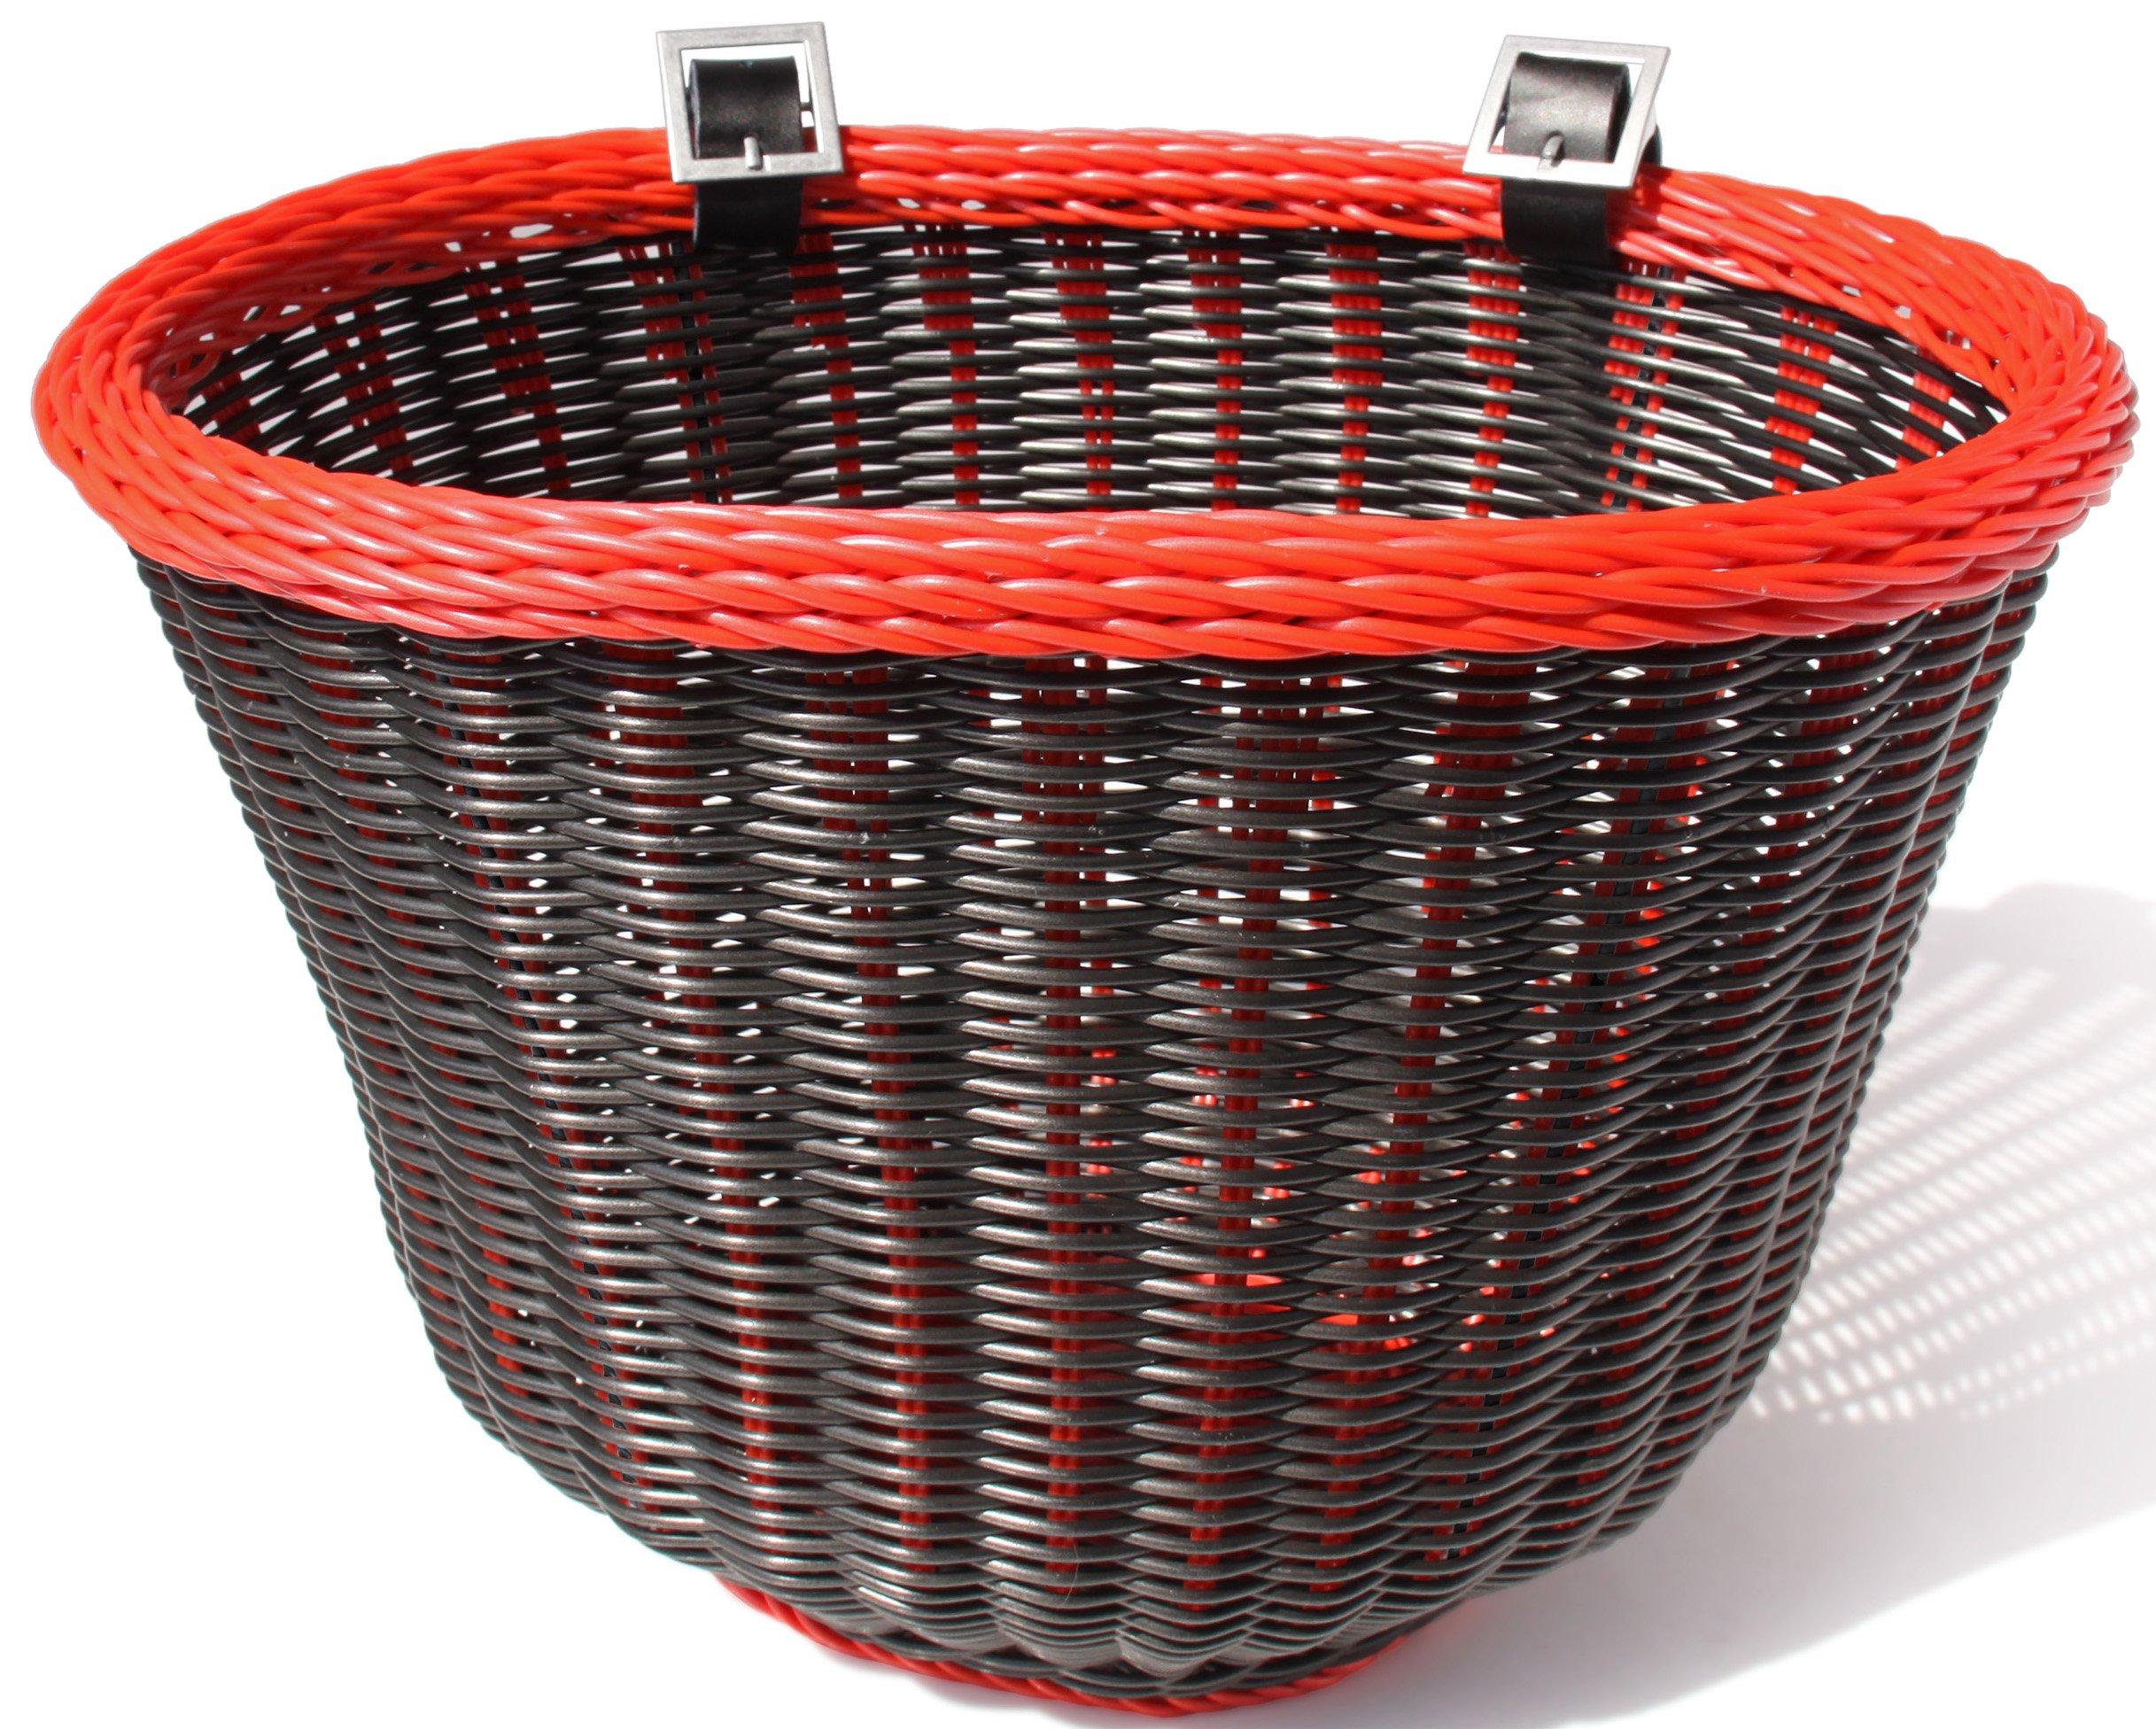 Colorbasket 01358 Front Handle Bar Adult Bike Basket, Water Resistant, Leather Straps, Black with Red Trim